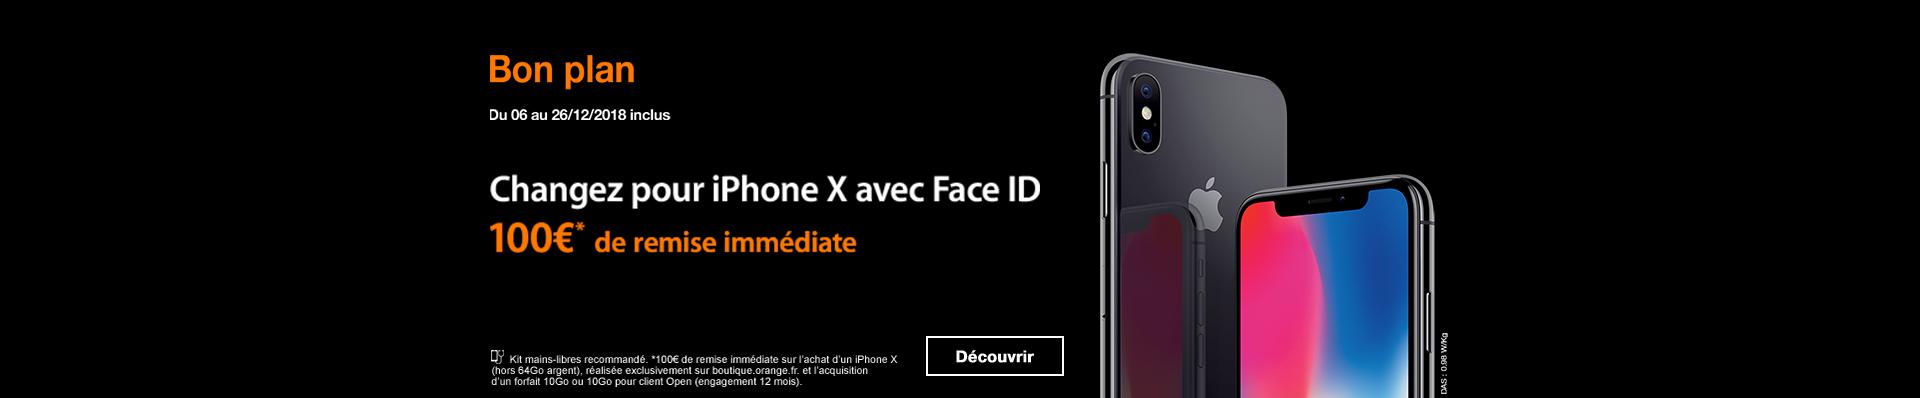 iPhone X ODR 100 euros